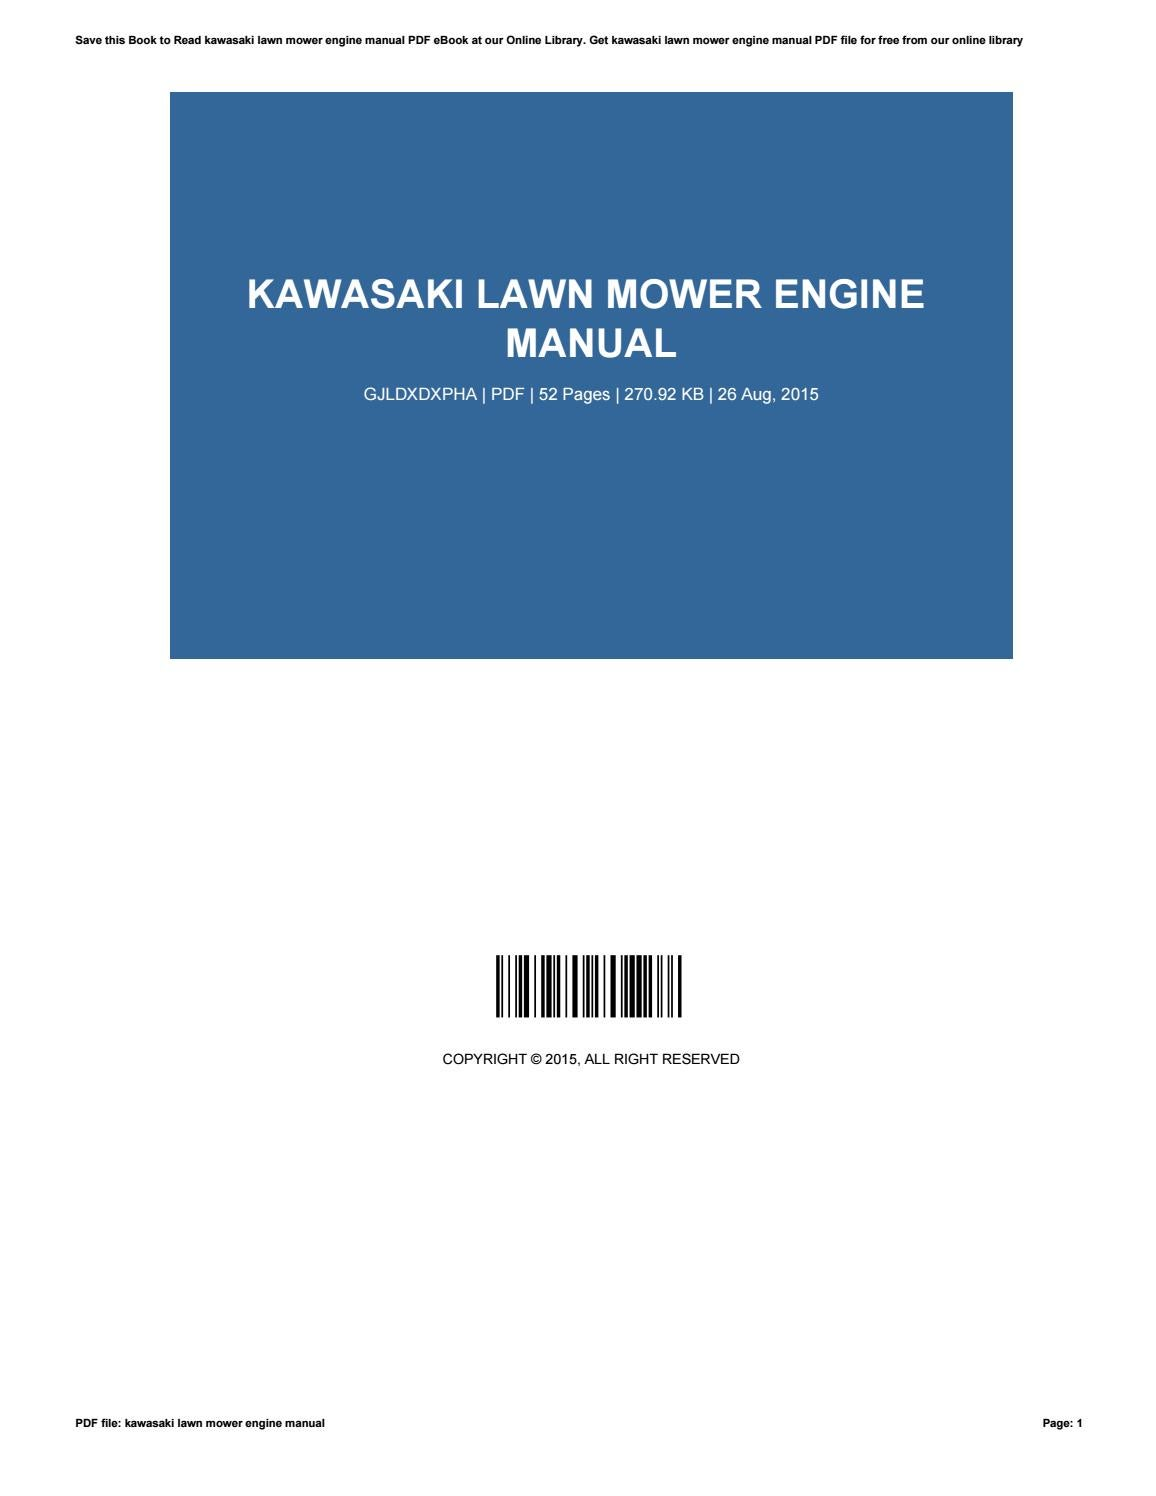 kawasaki lawn mower engine manual by luke issuu rh issuu com 25 HP Kawasaki Engine Kawasaki Lawn Mower Engine Repair